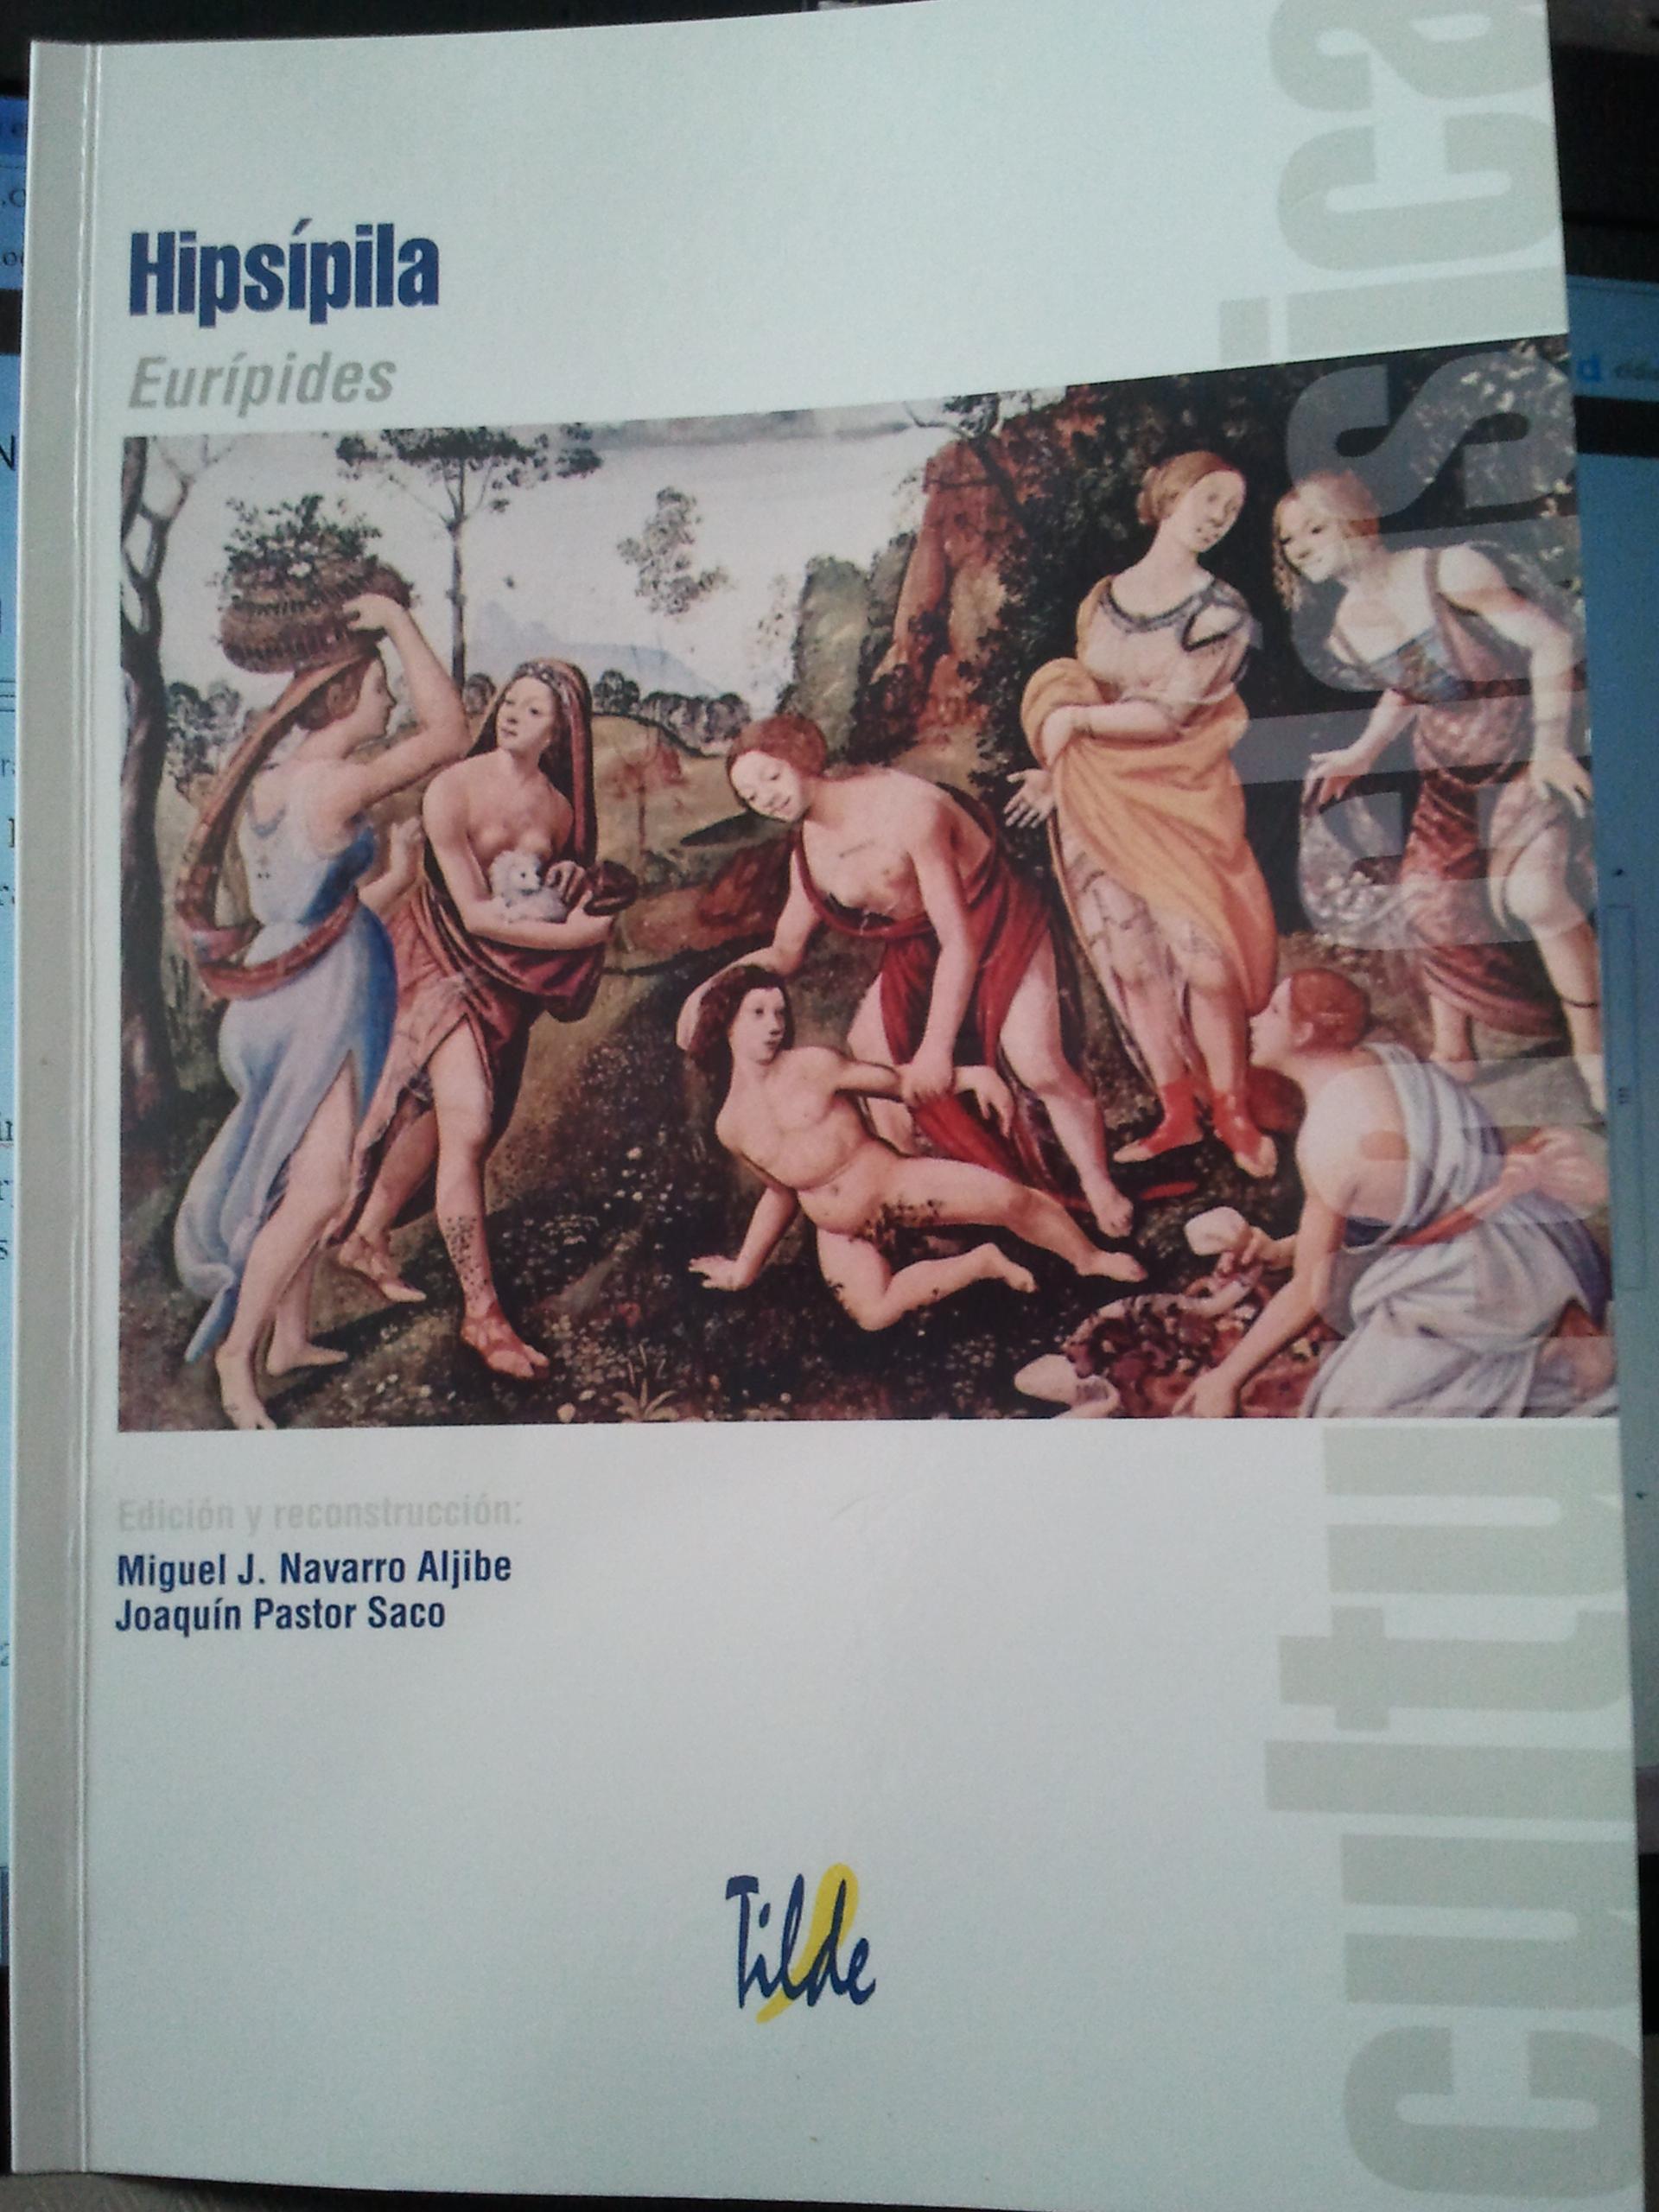 Hipsípila